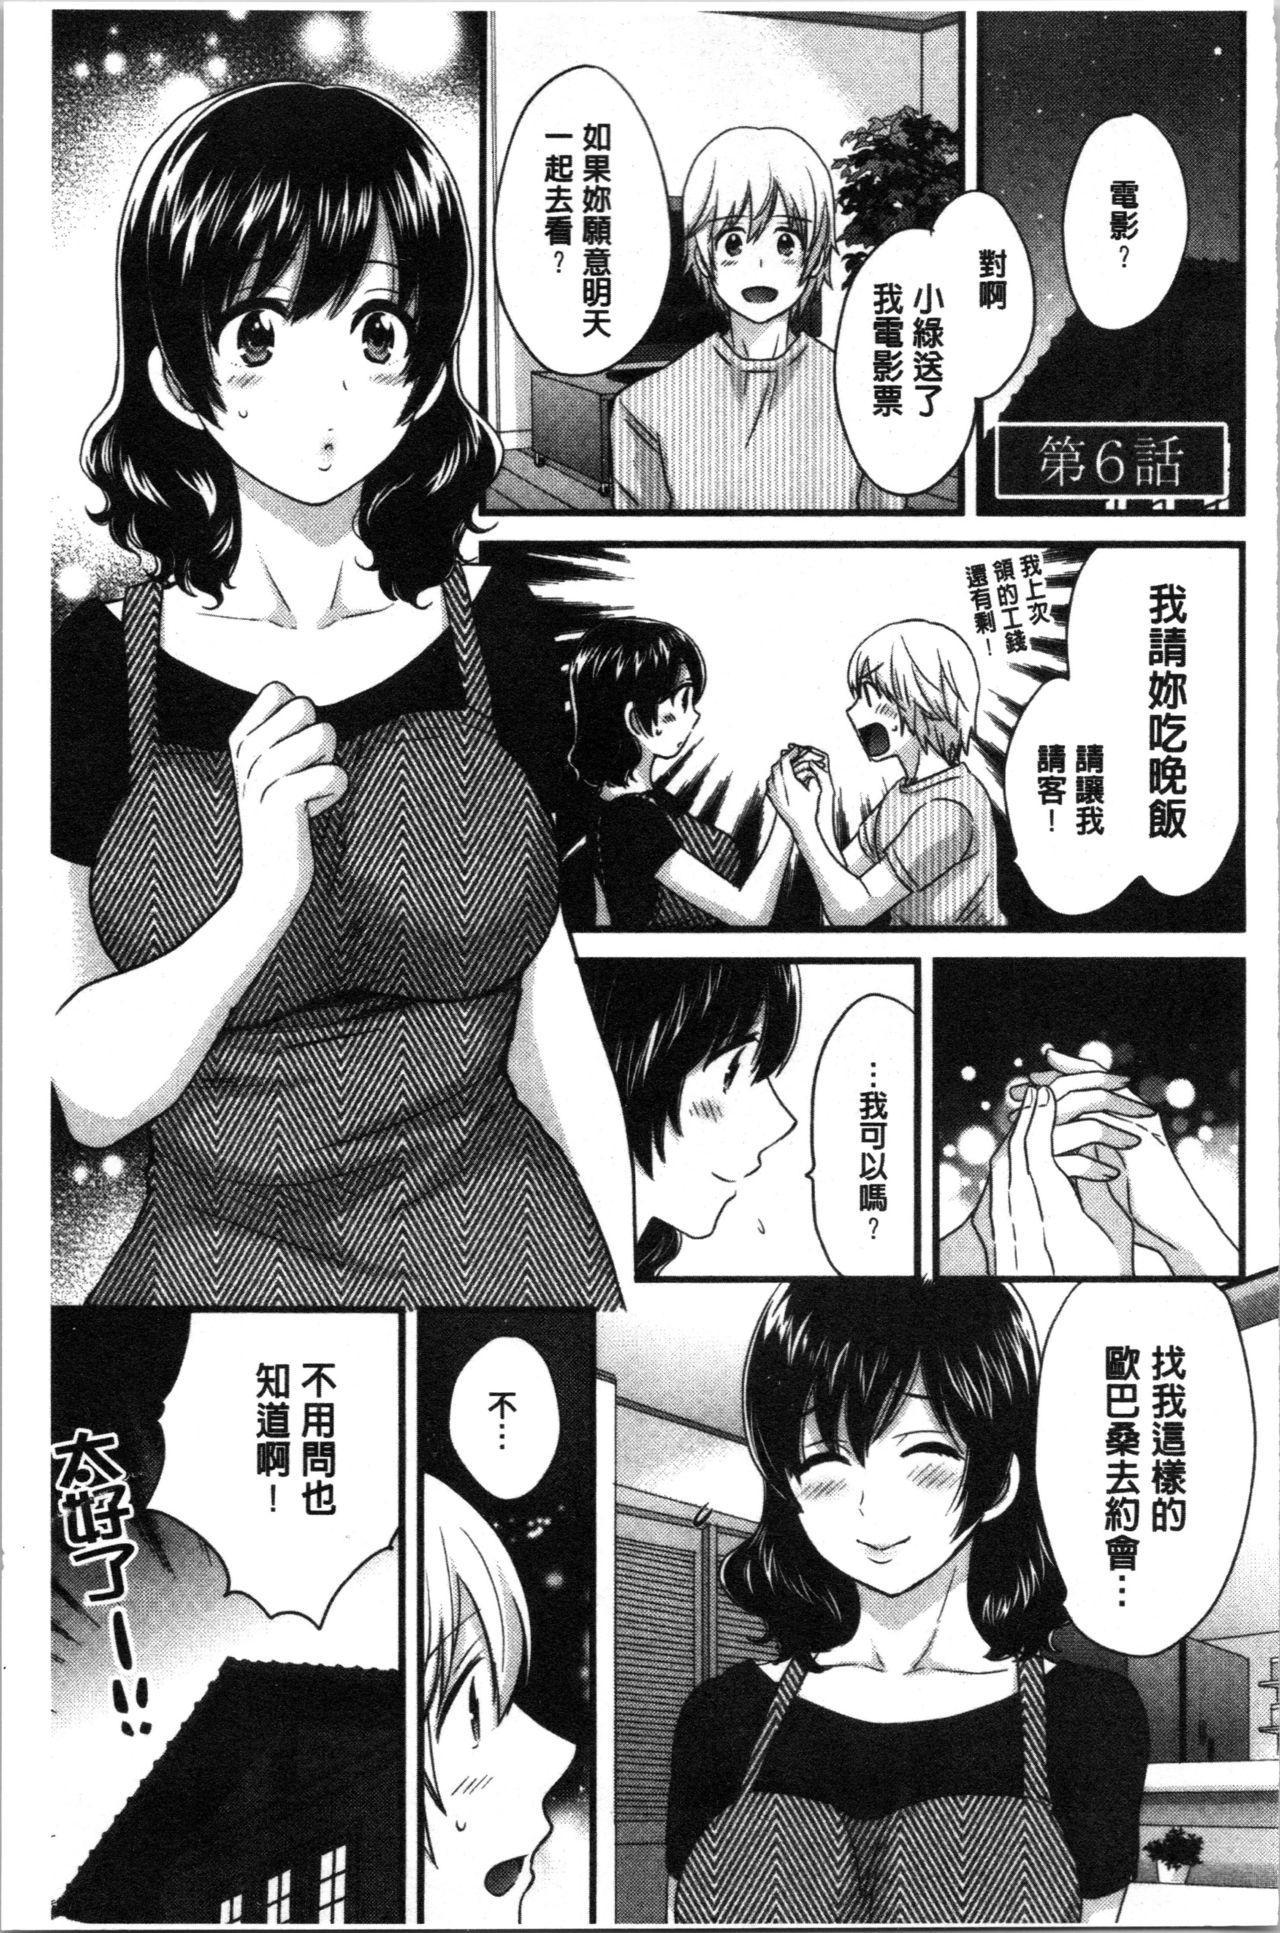 Ottori Midarana Mikami-san   嫻淑優雅又淫亂的三上小姐 98